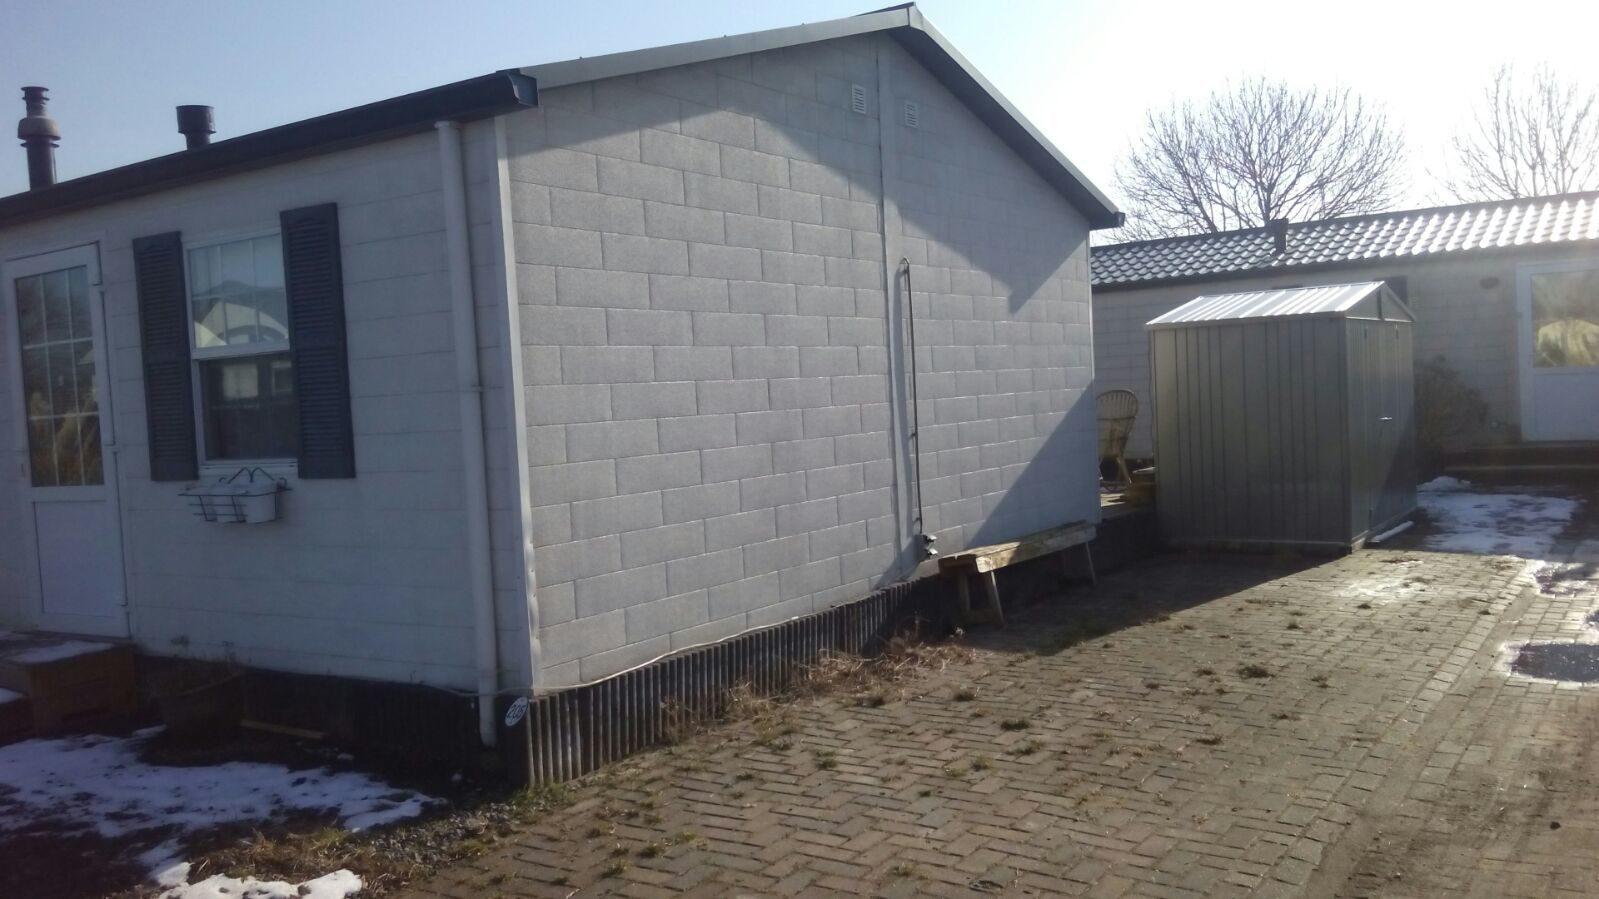 205 - Chaletpark Holiday Vraagprijs €58.500